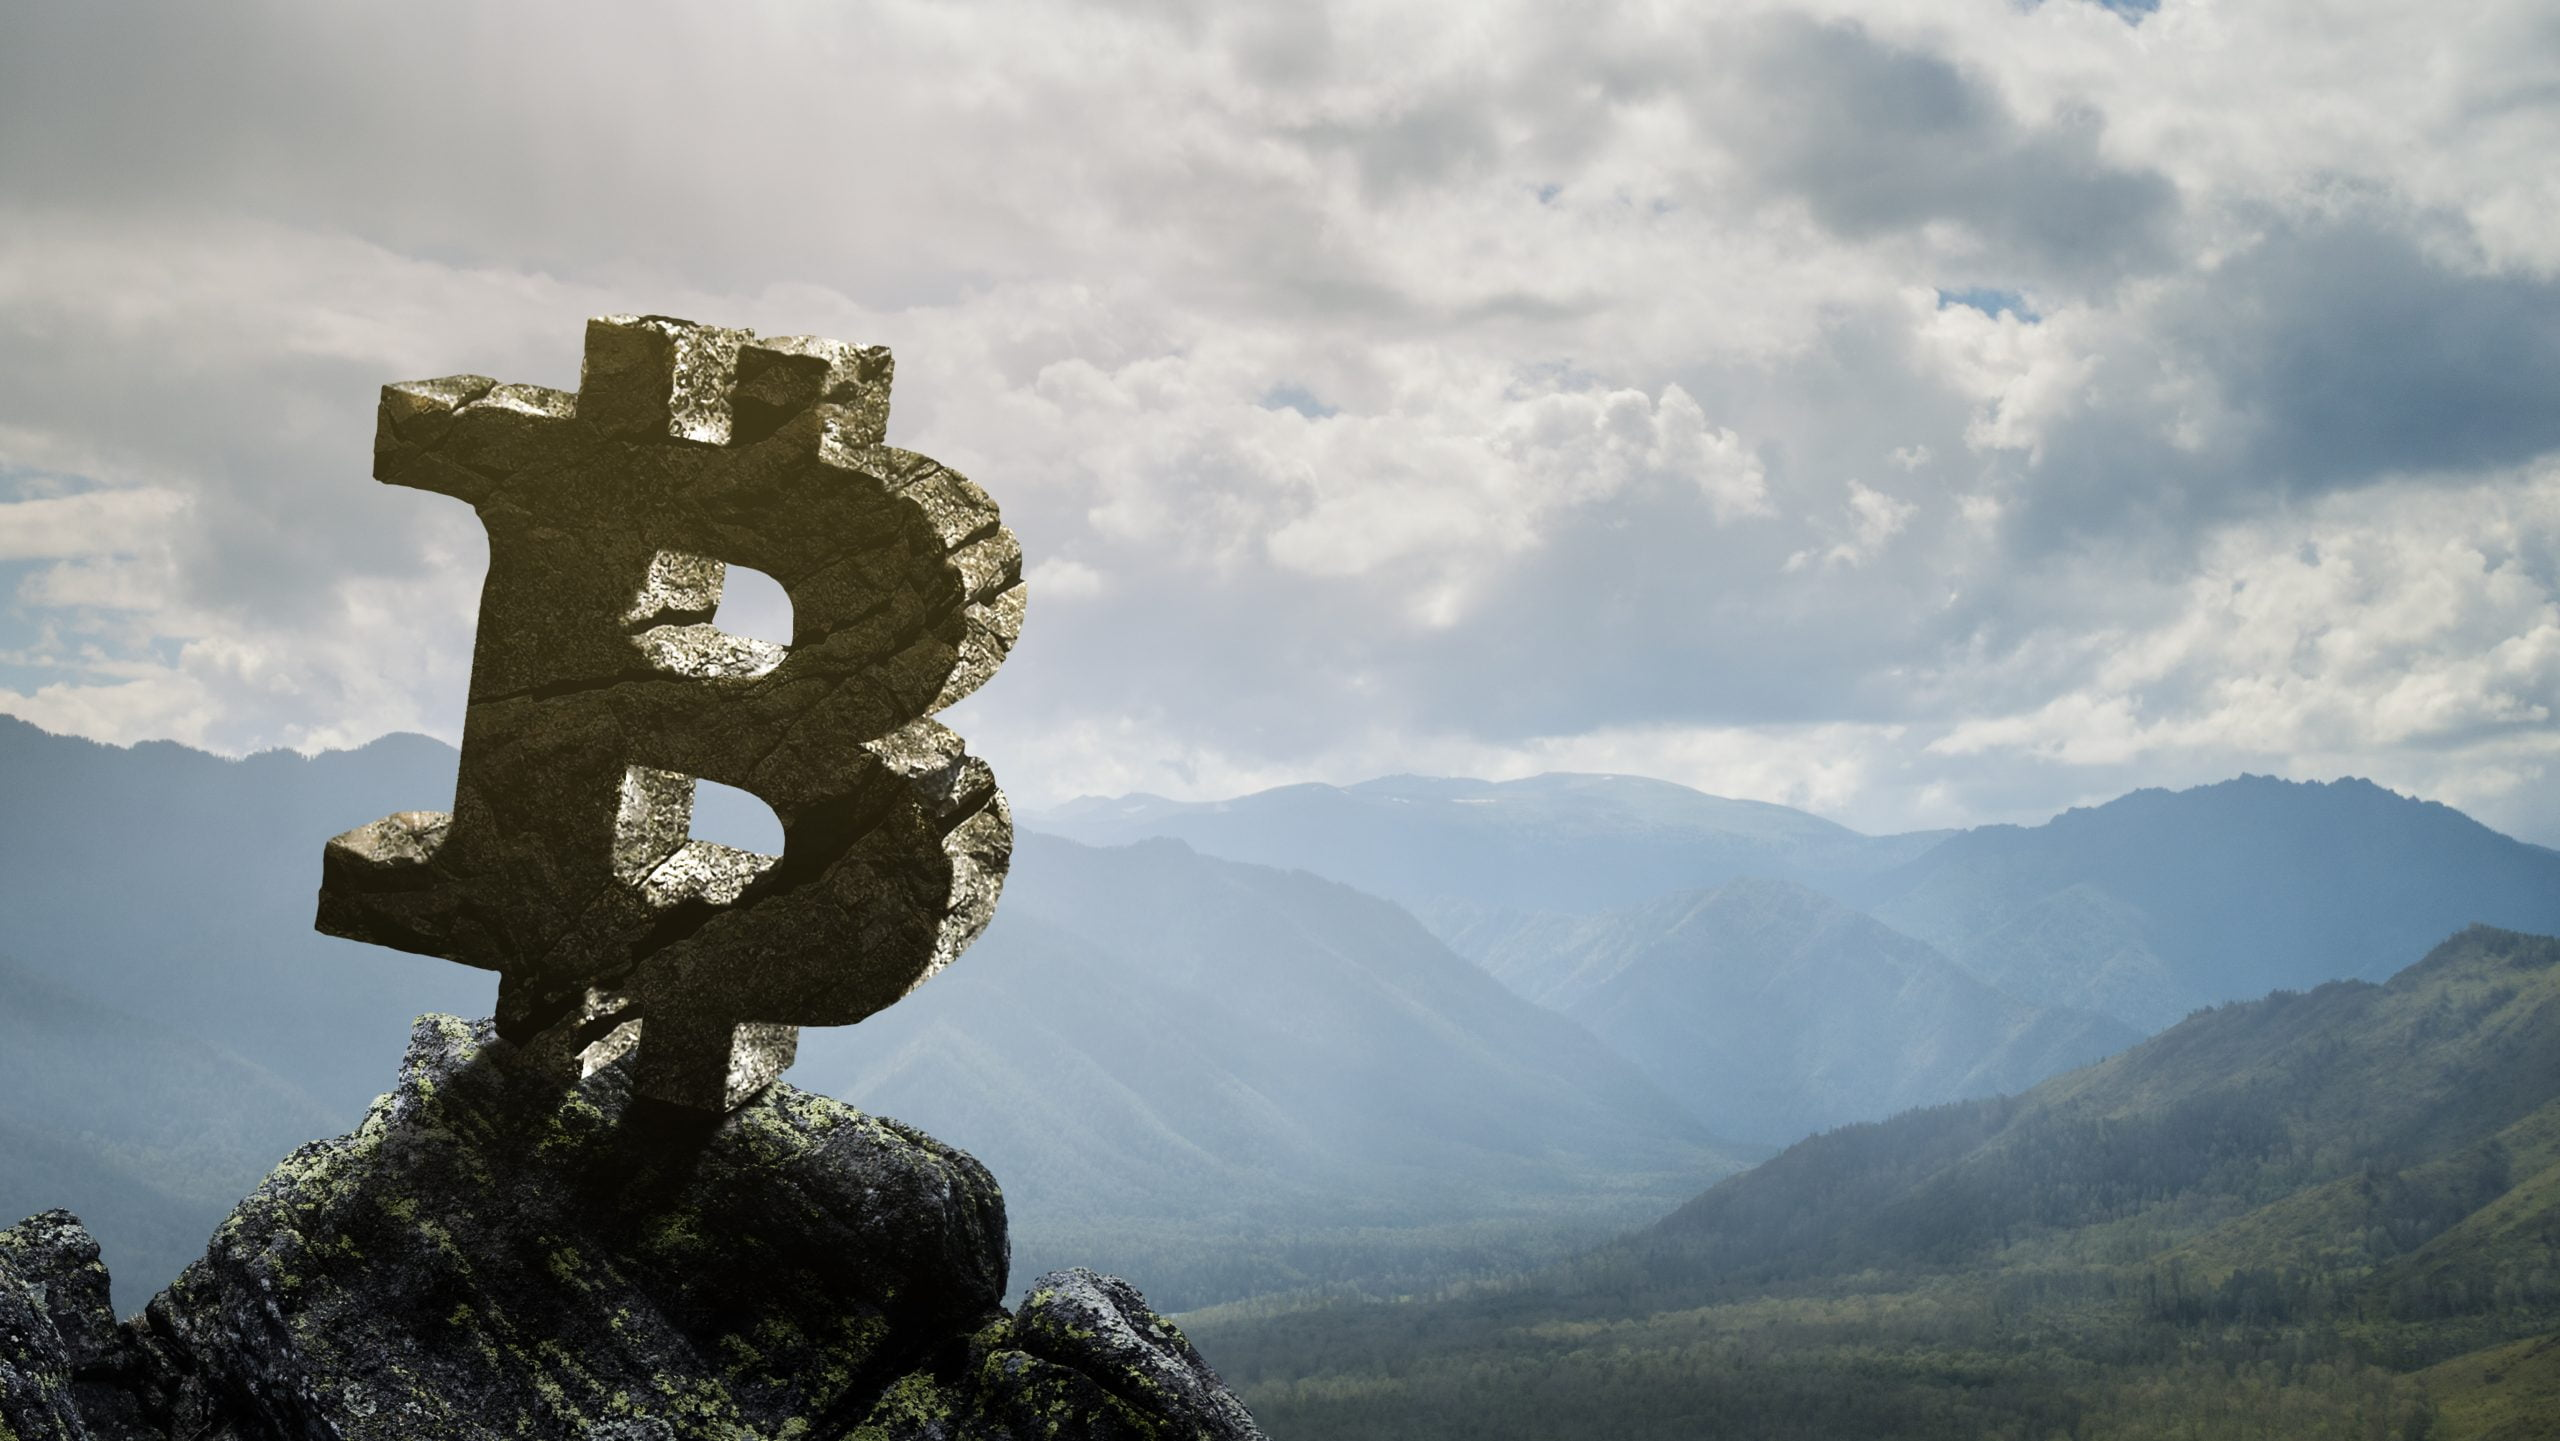 2018deki cokusu ongormesiyle taninan usta trader bitcoini btc yukseltecek temel katalizoru acikladi